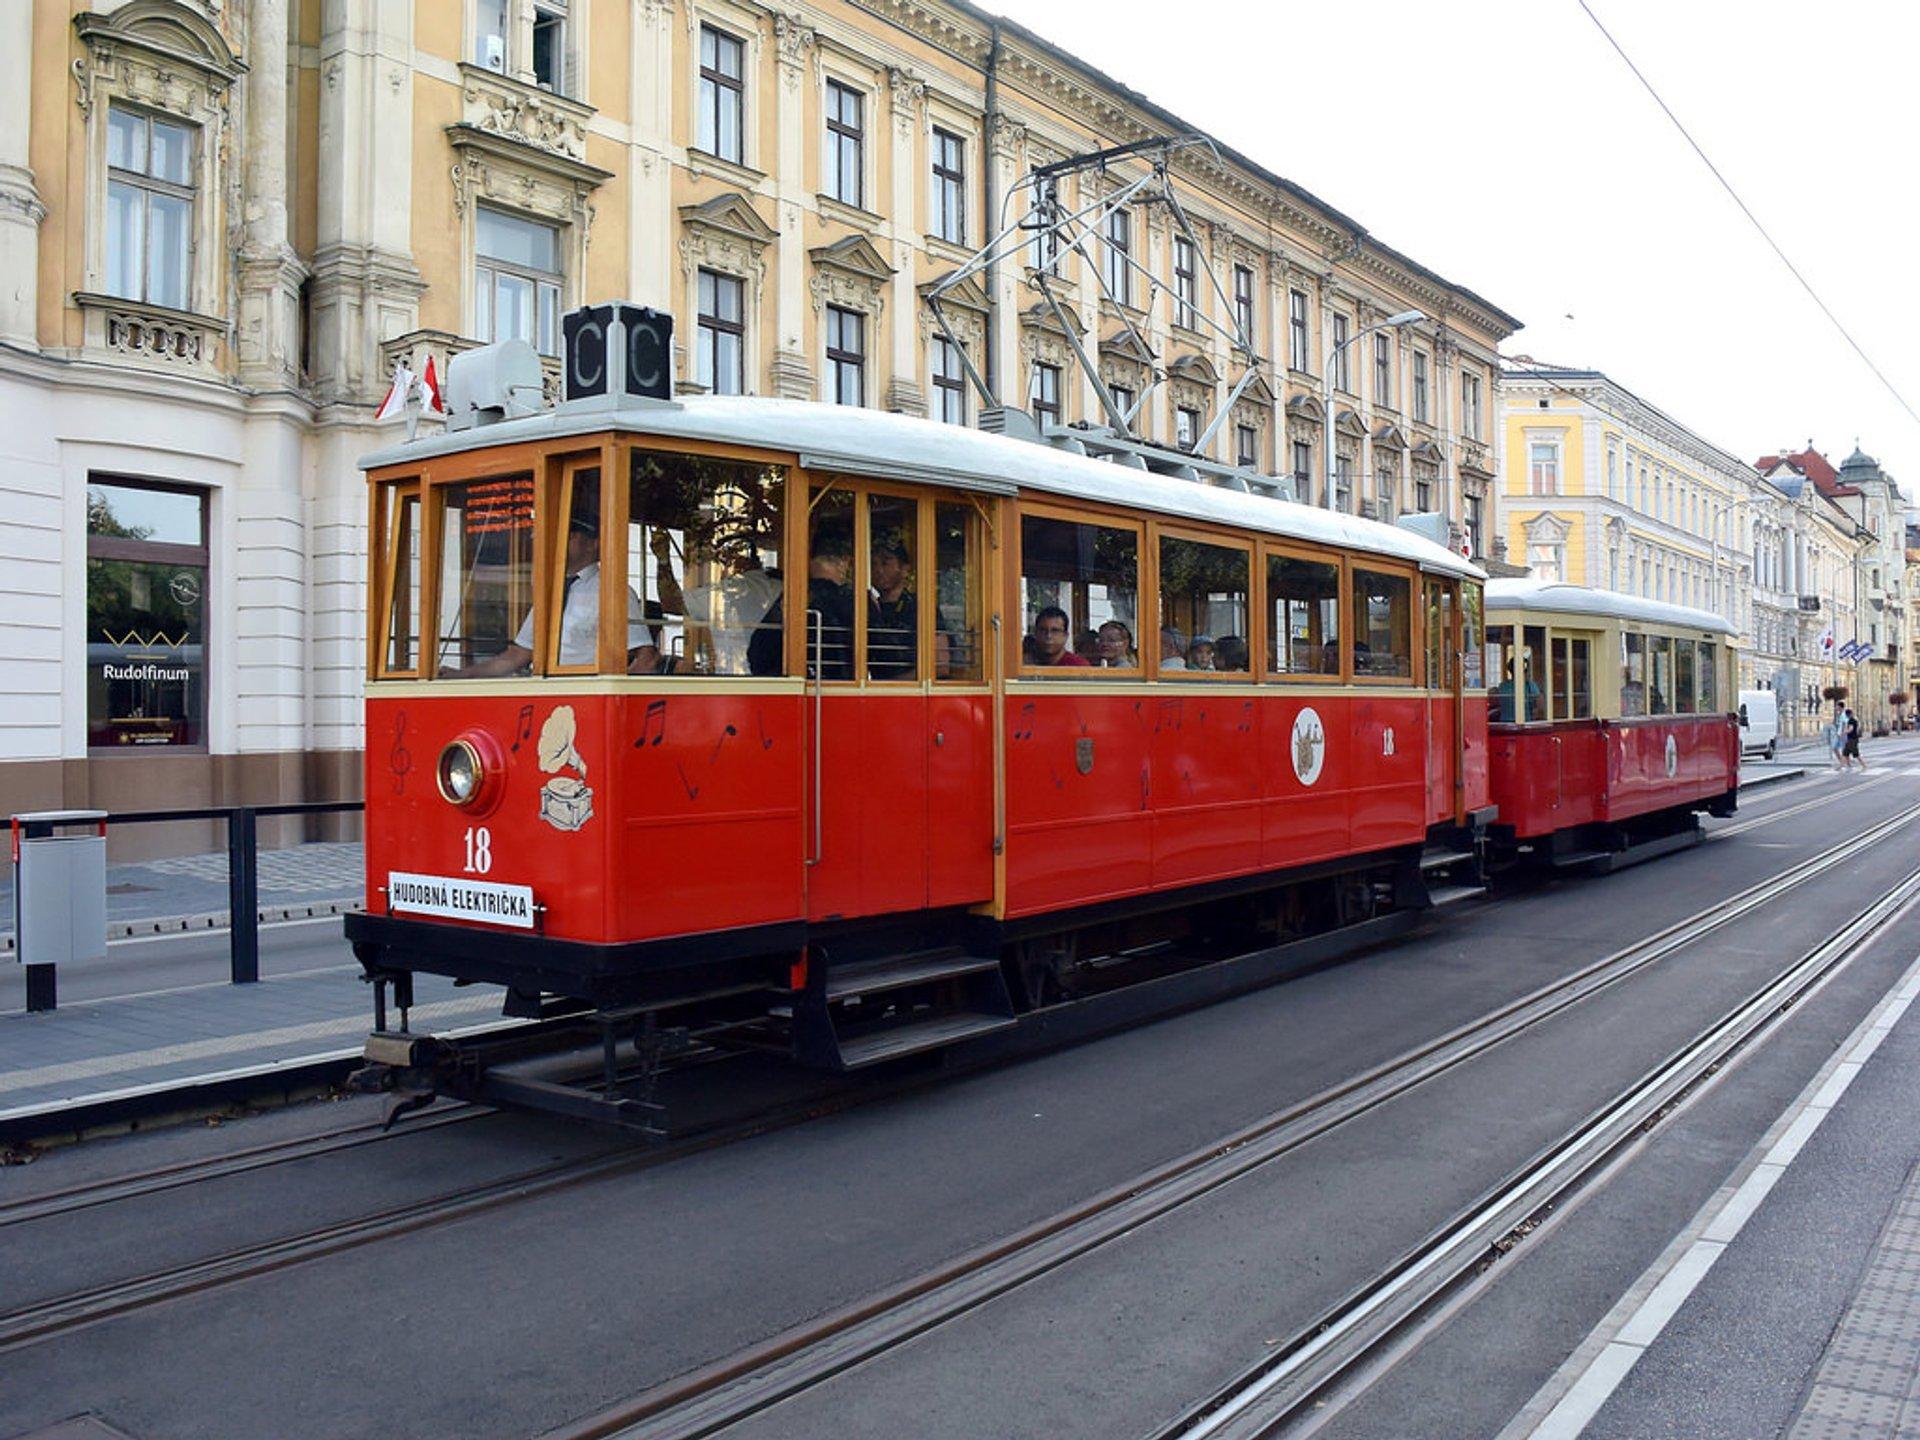 Bratislava Music Tram in Slovakia - Best Season